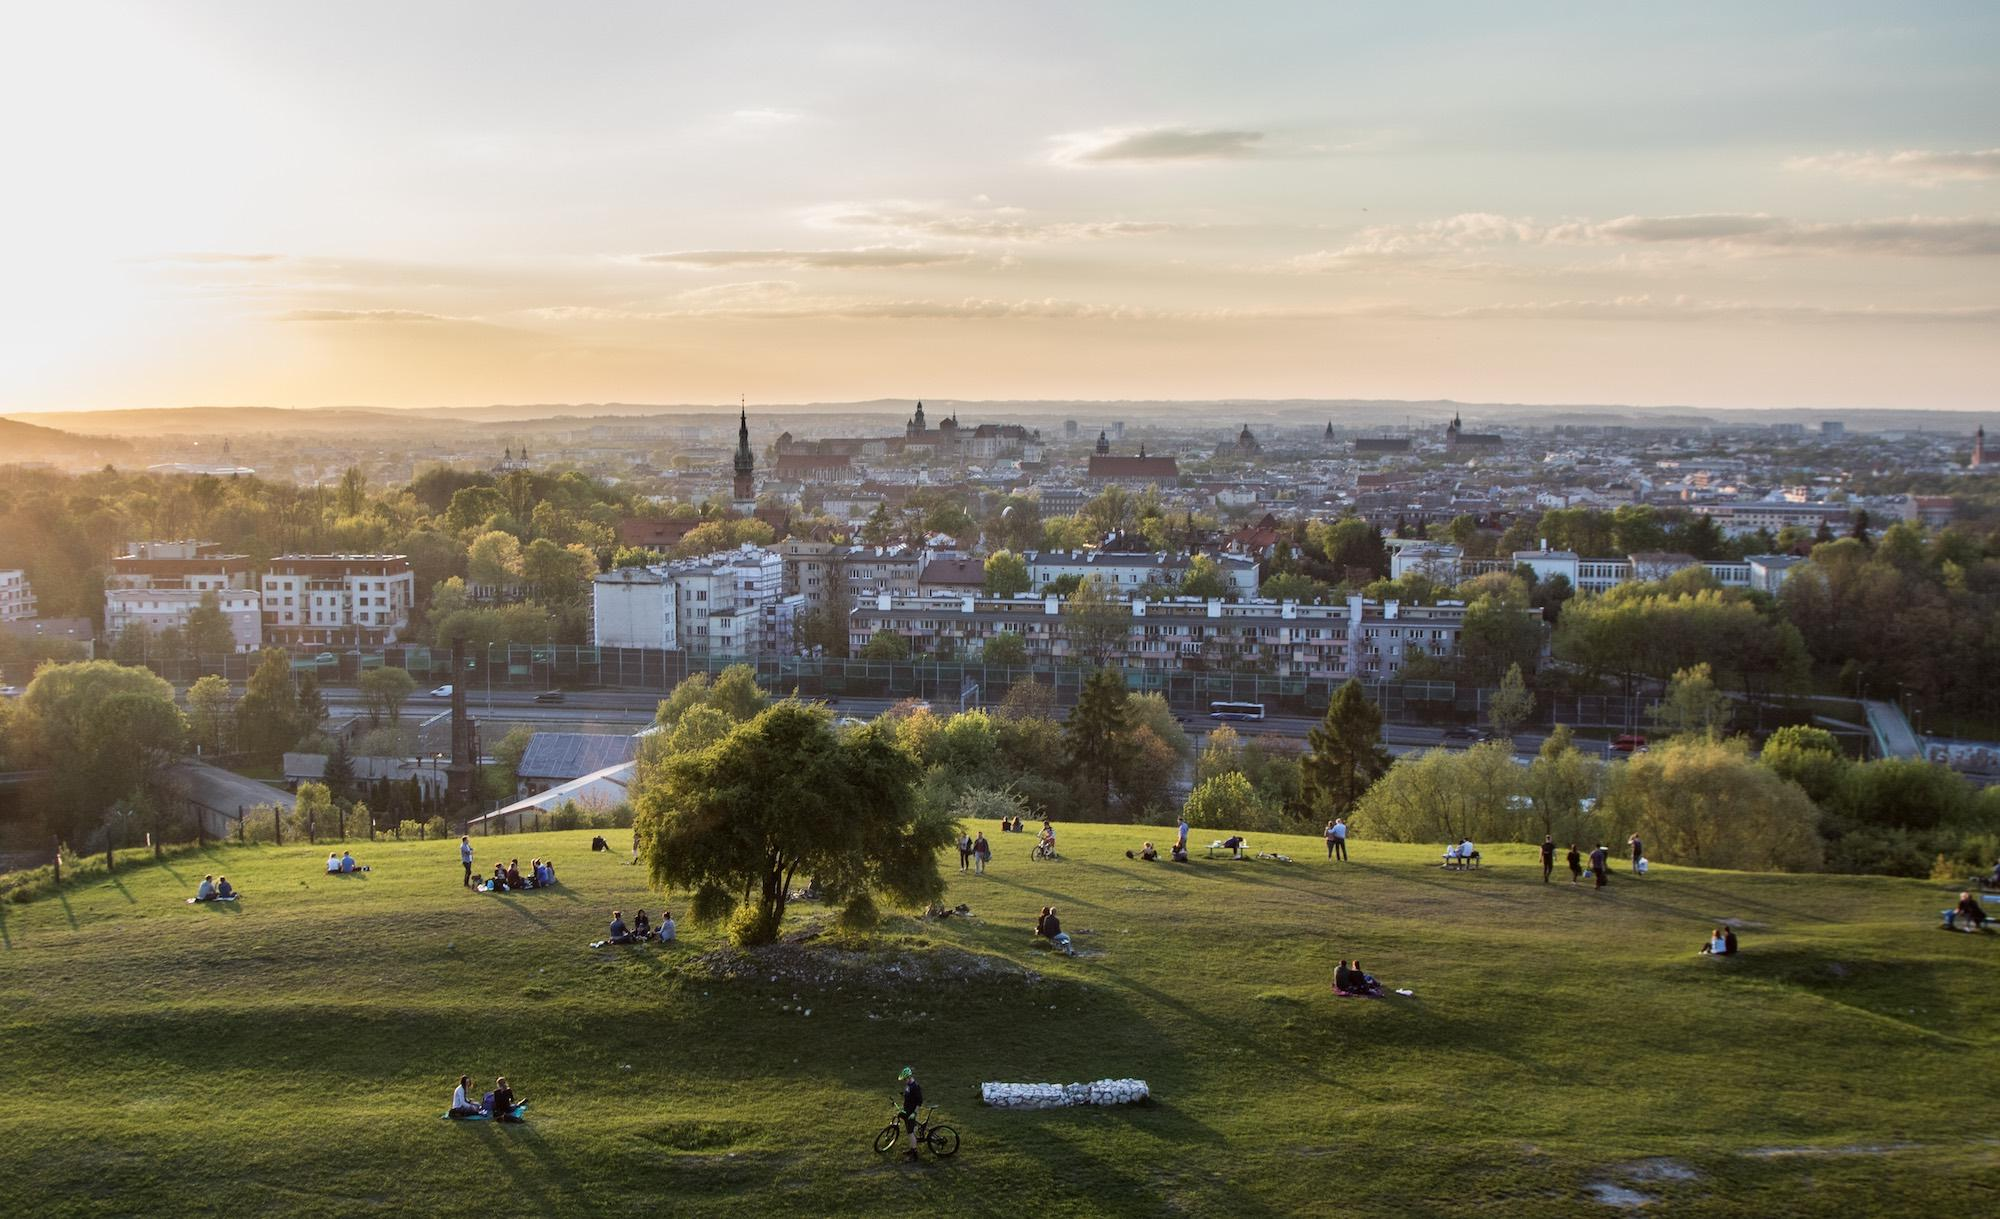 View of Krakow from Krakus Mound – © JaGra / Shutterstock